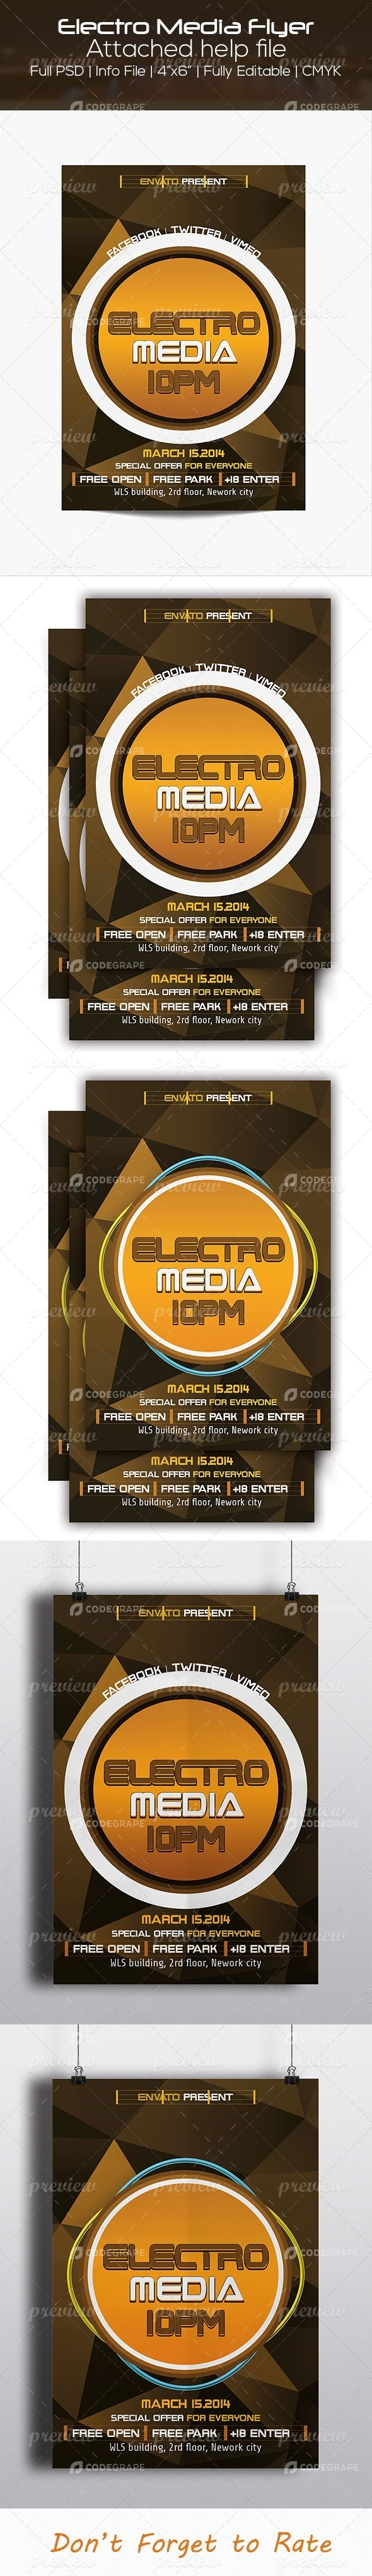 Electro Media Flyer